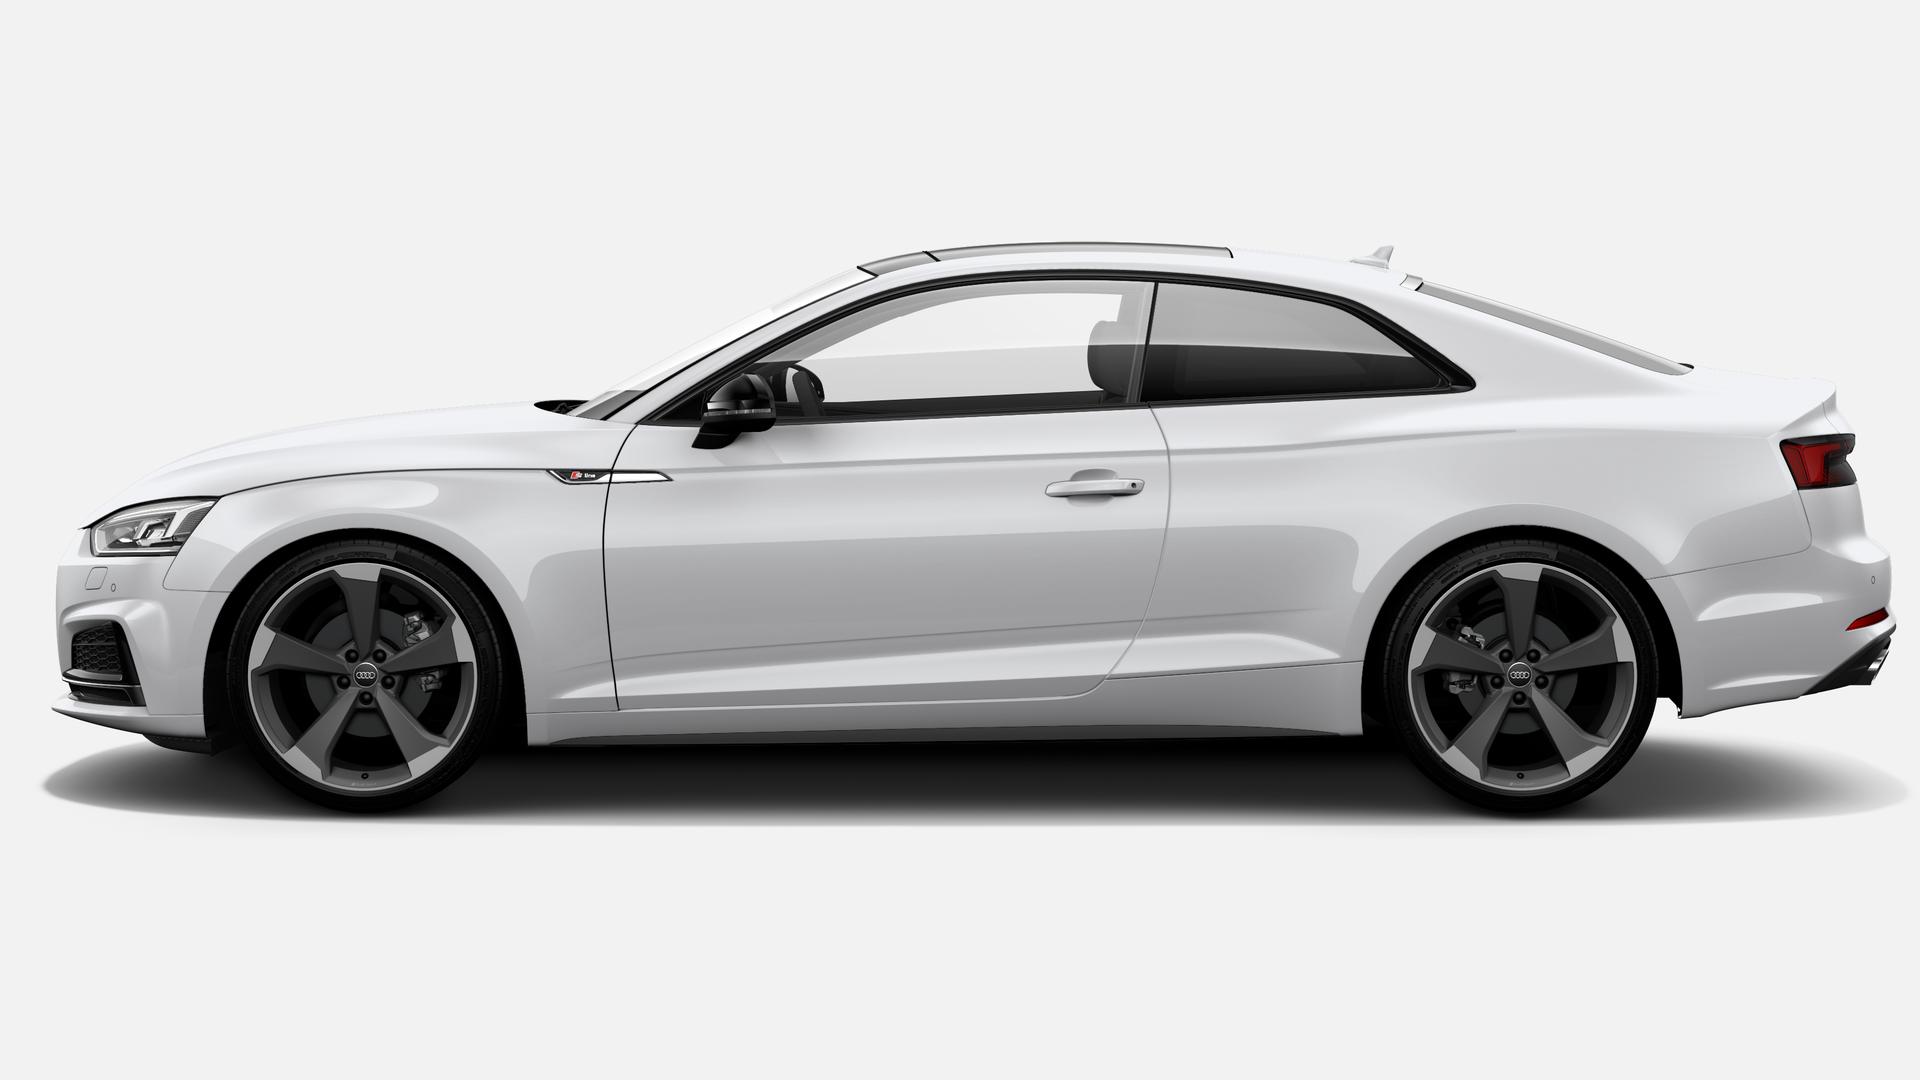 Vista Lateral izquierda de Audi A5 Coupe 40 TFSI S line S tronic 140 kW (190 CV)